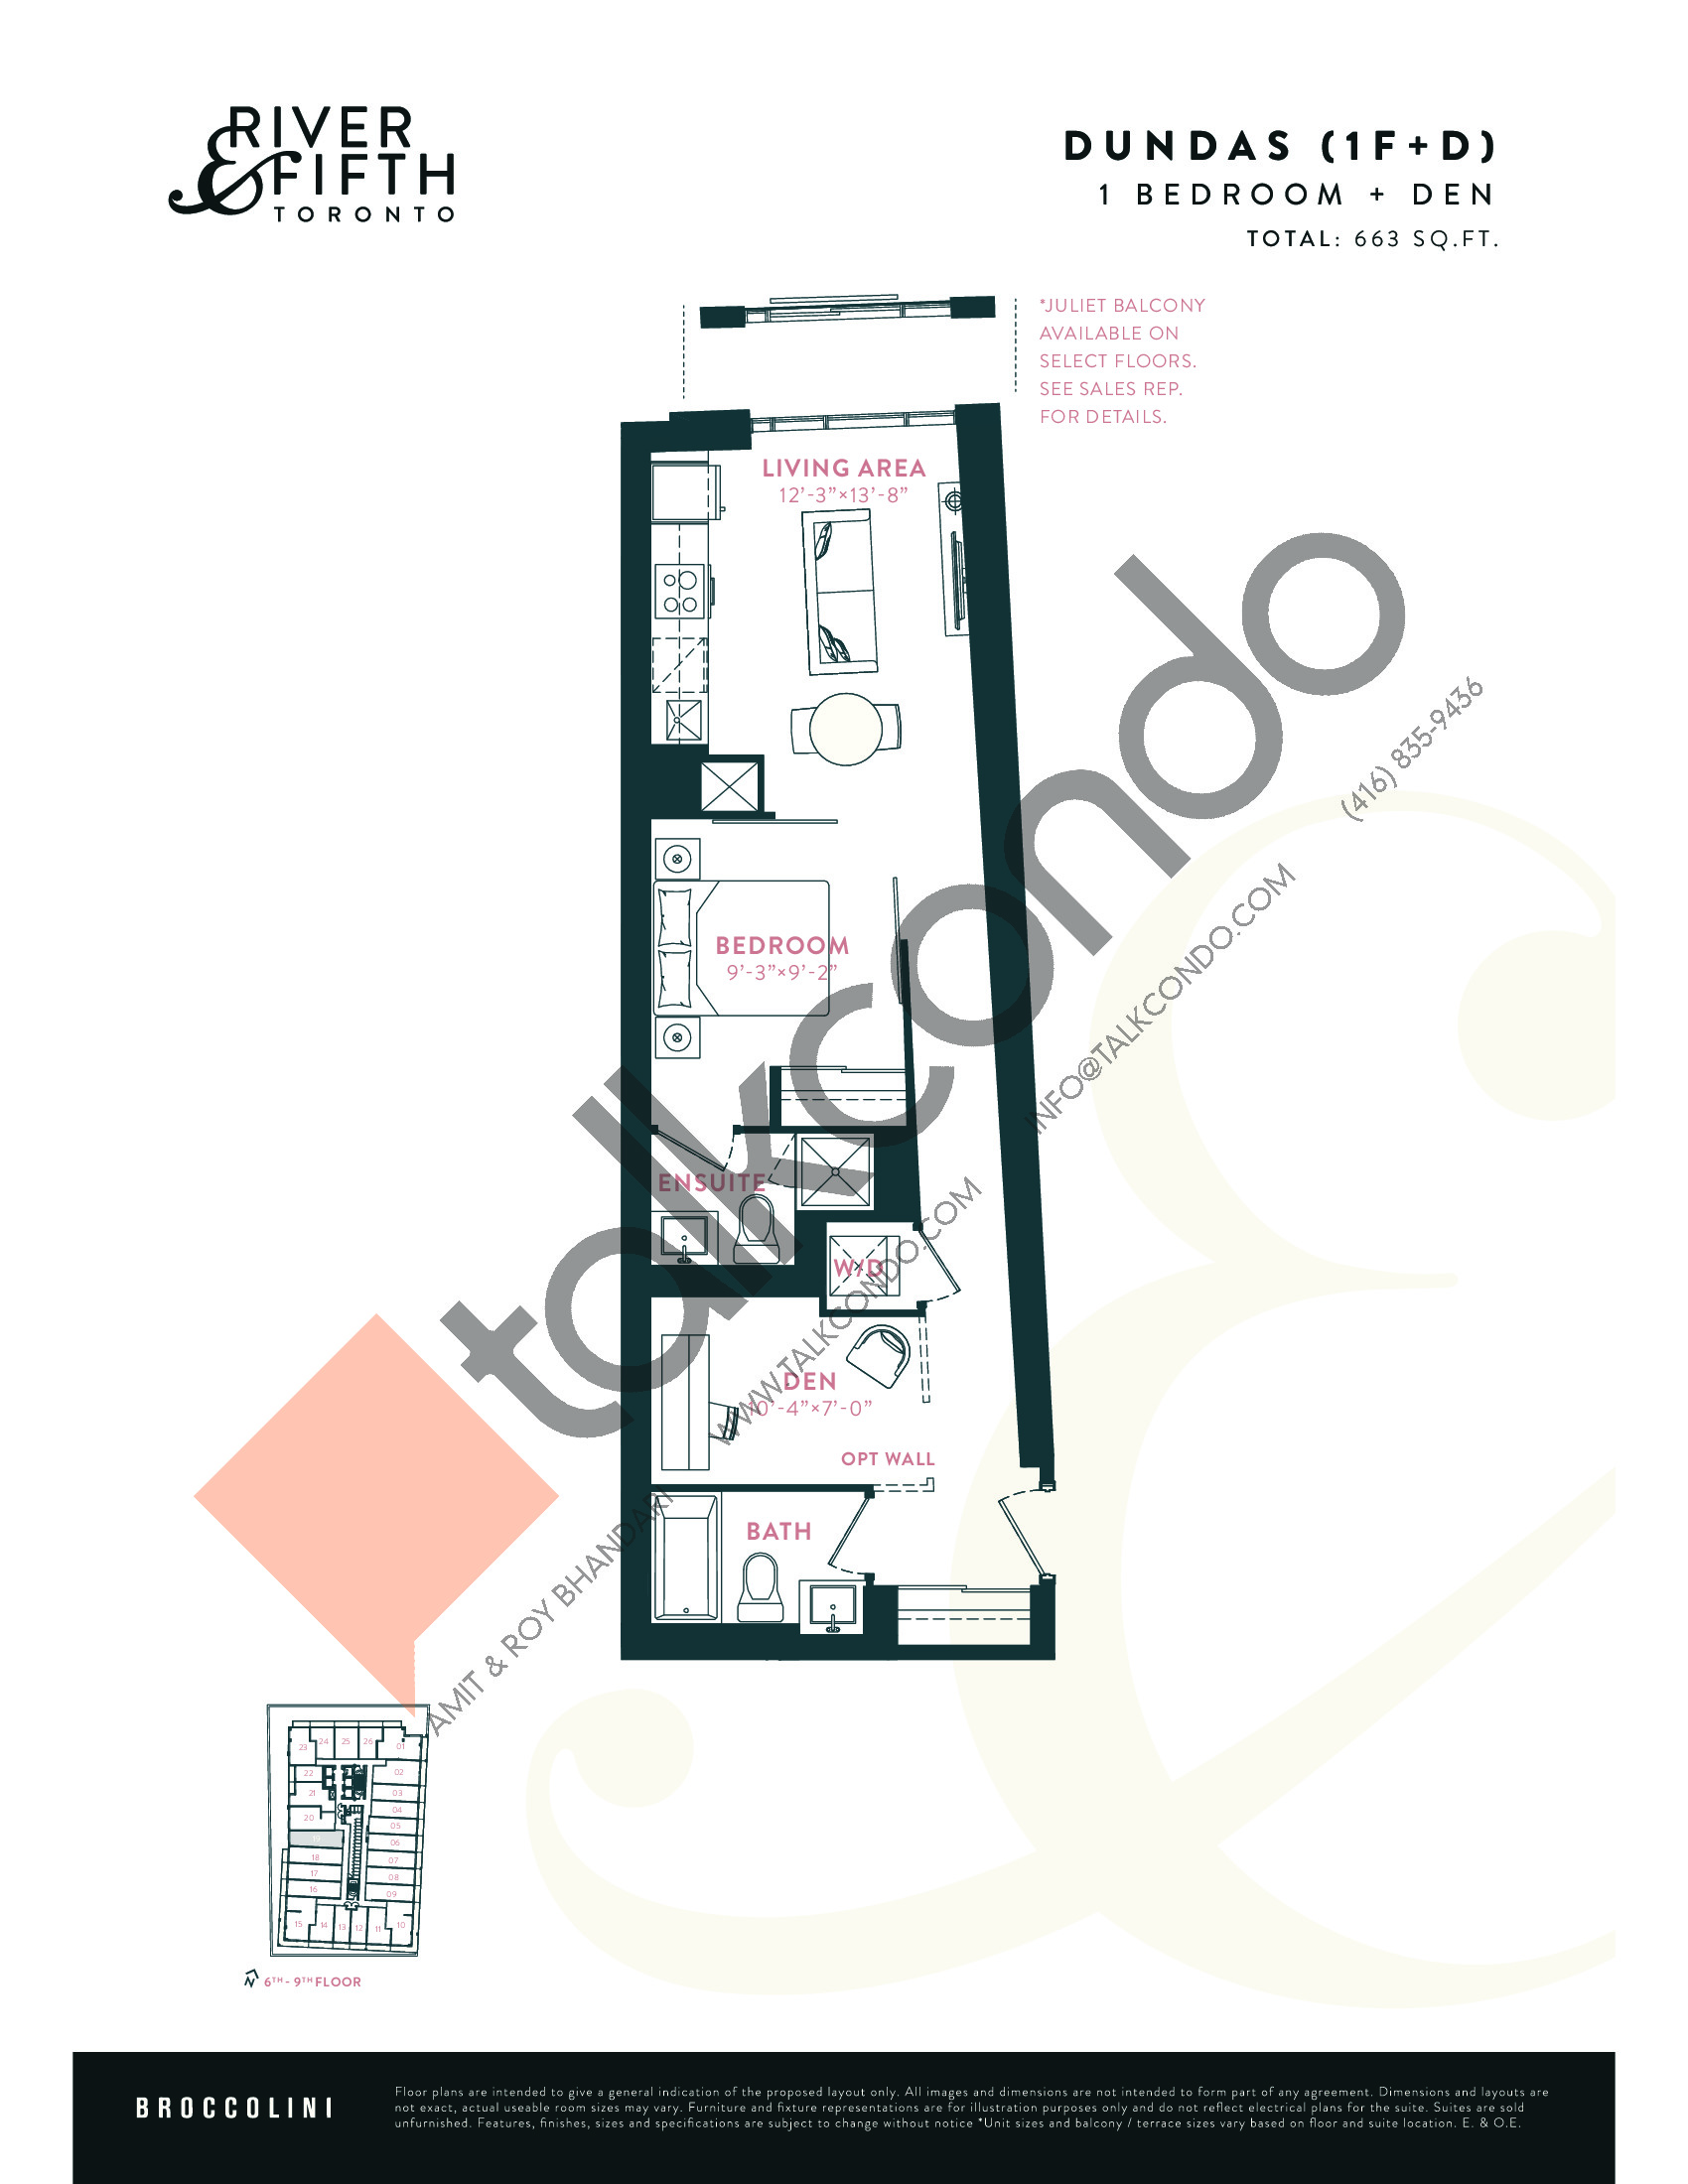 Dundas (1F+D) Floor Plan at River & Fifth Condos - 663 sq.ft